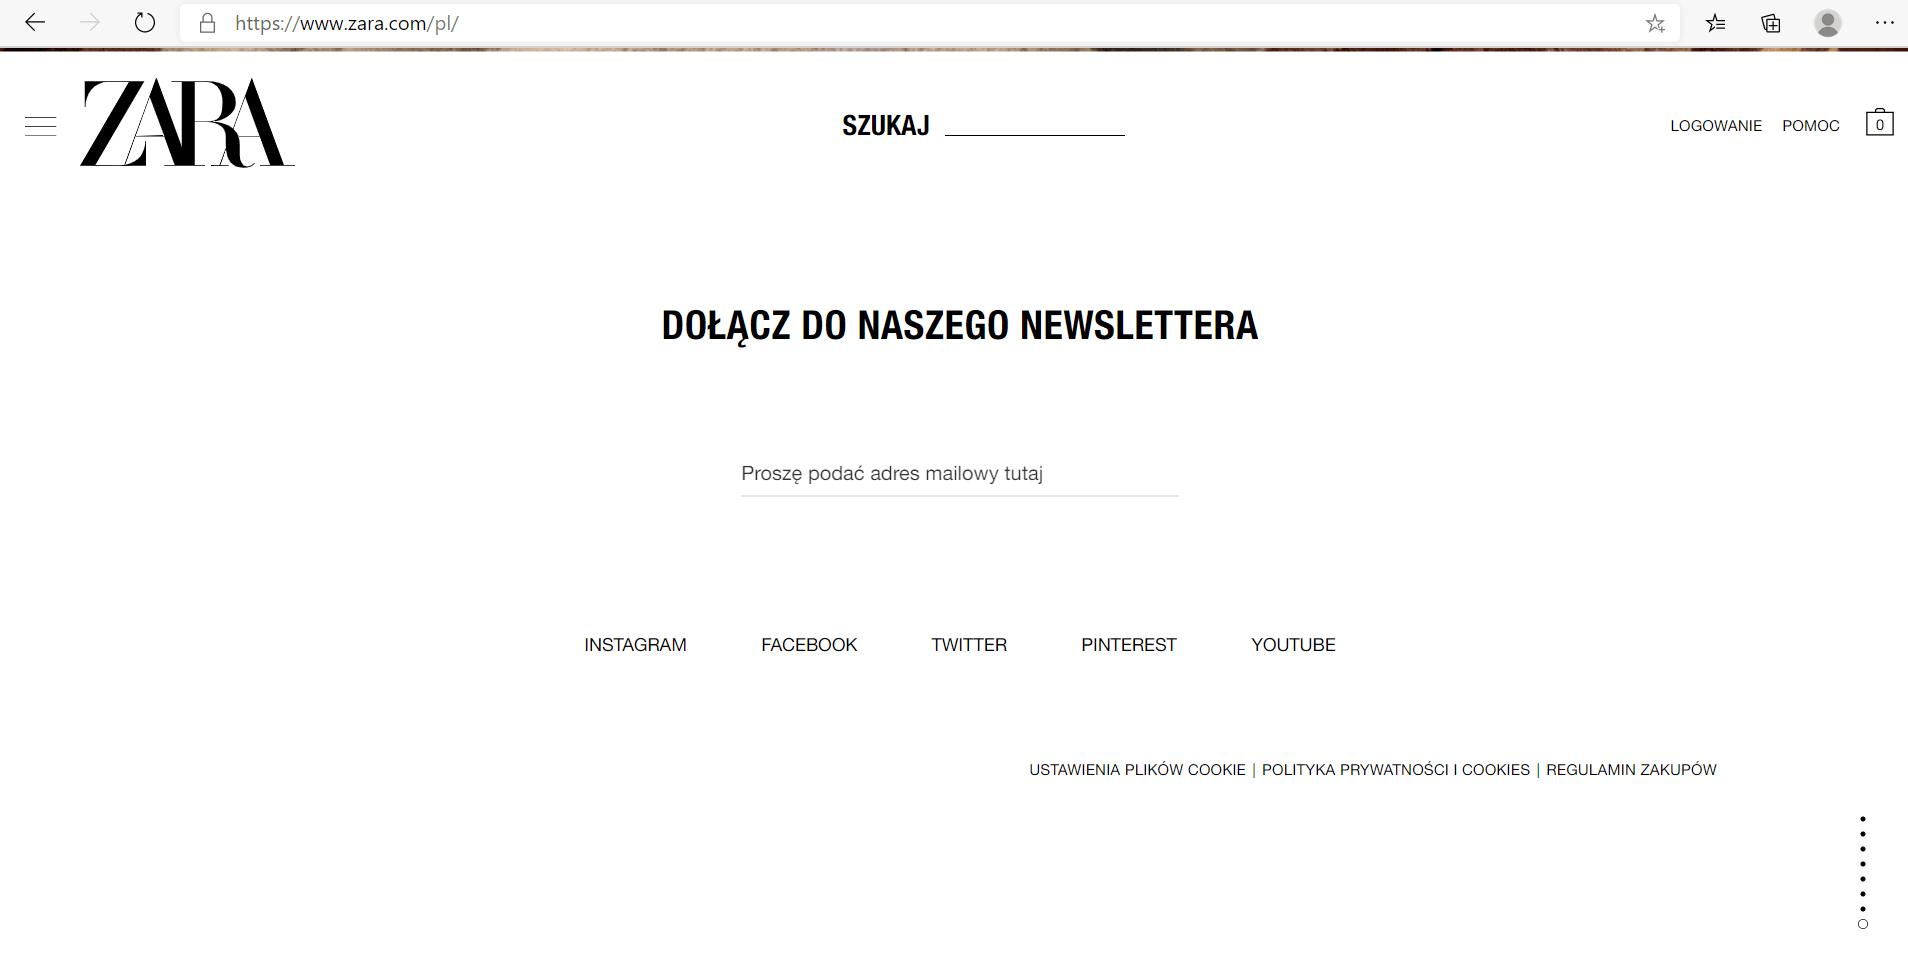 Newsletter w marketingu